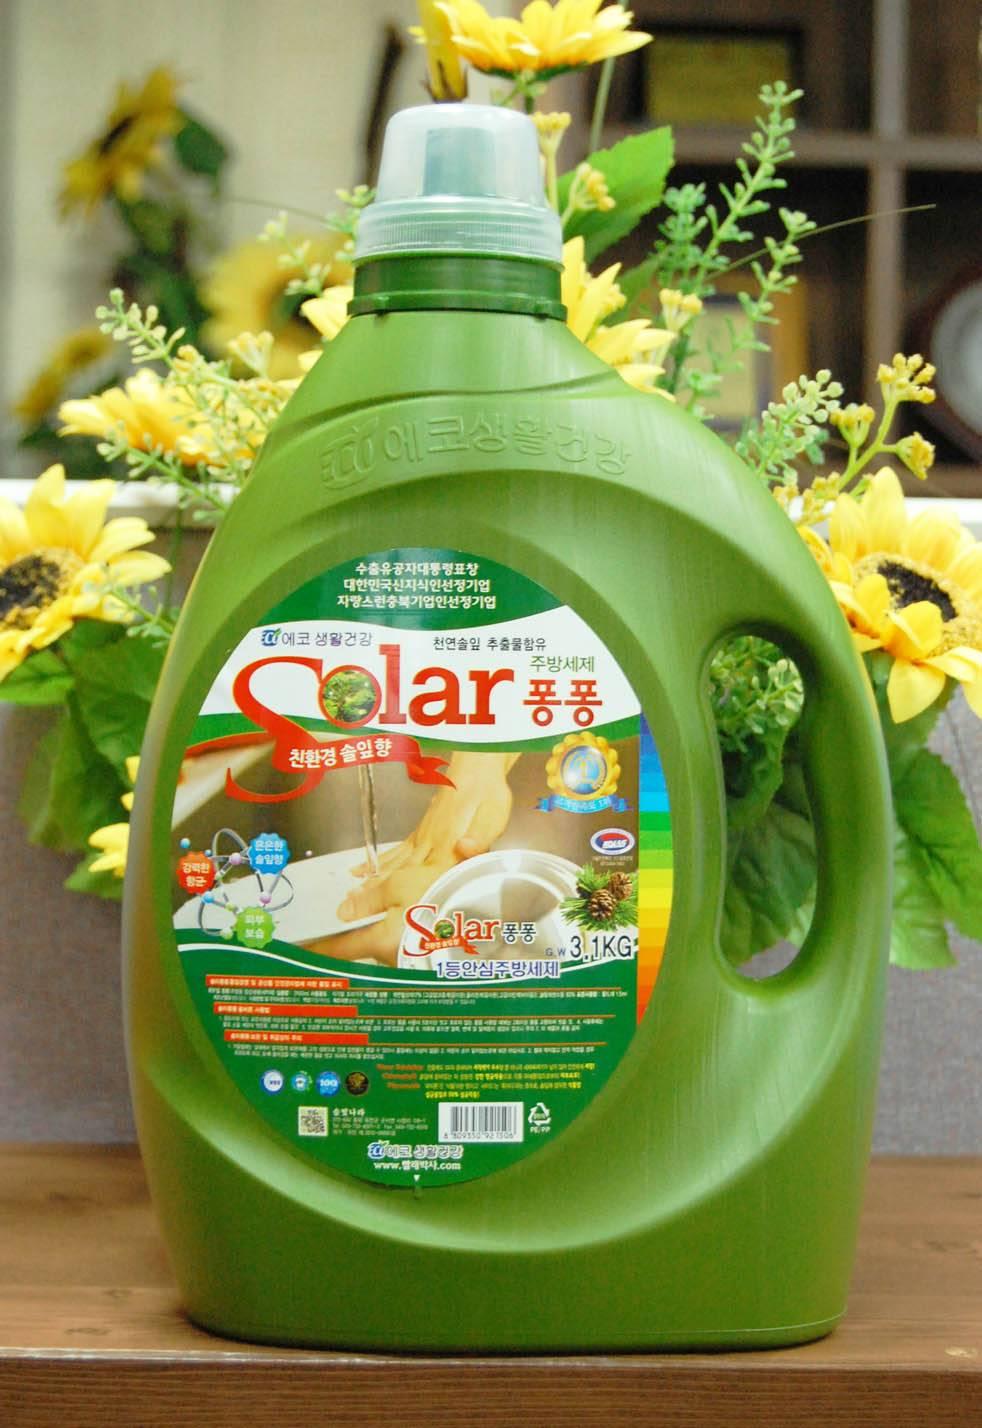 Solar PongPong (Dishwashing Detergent)